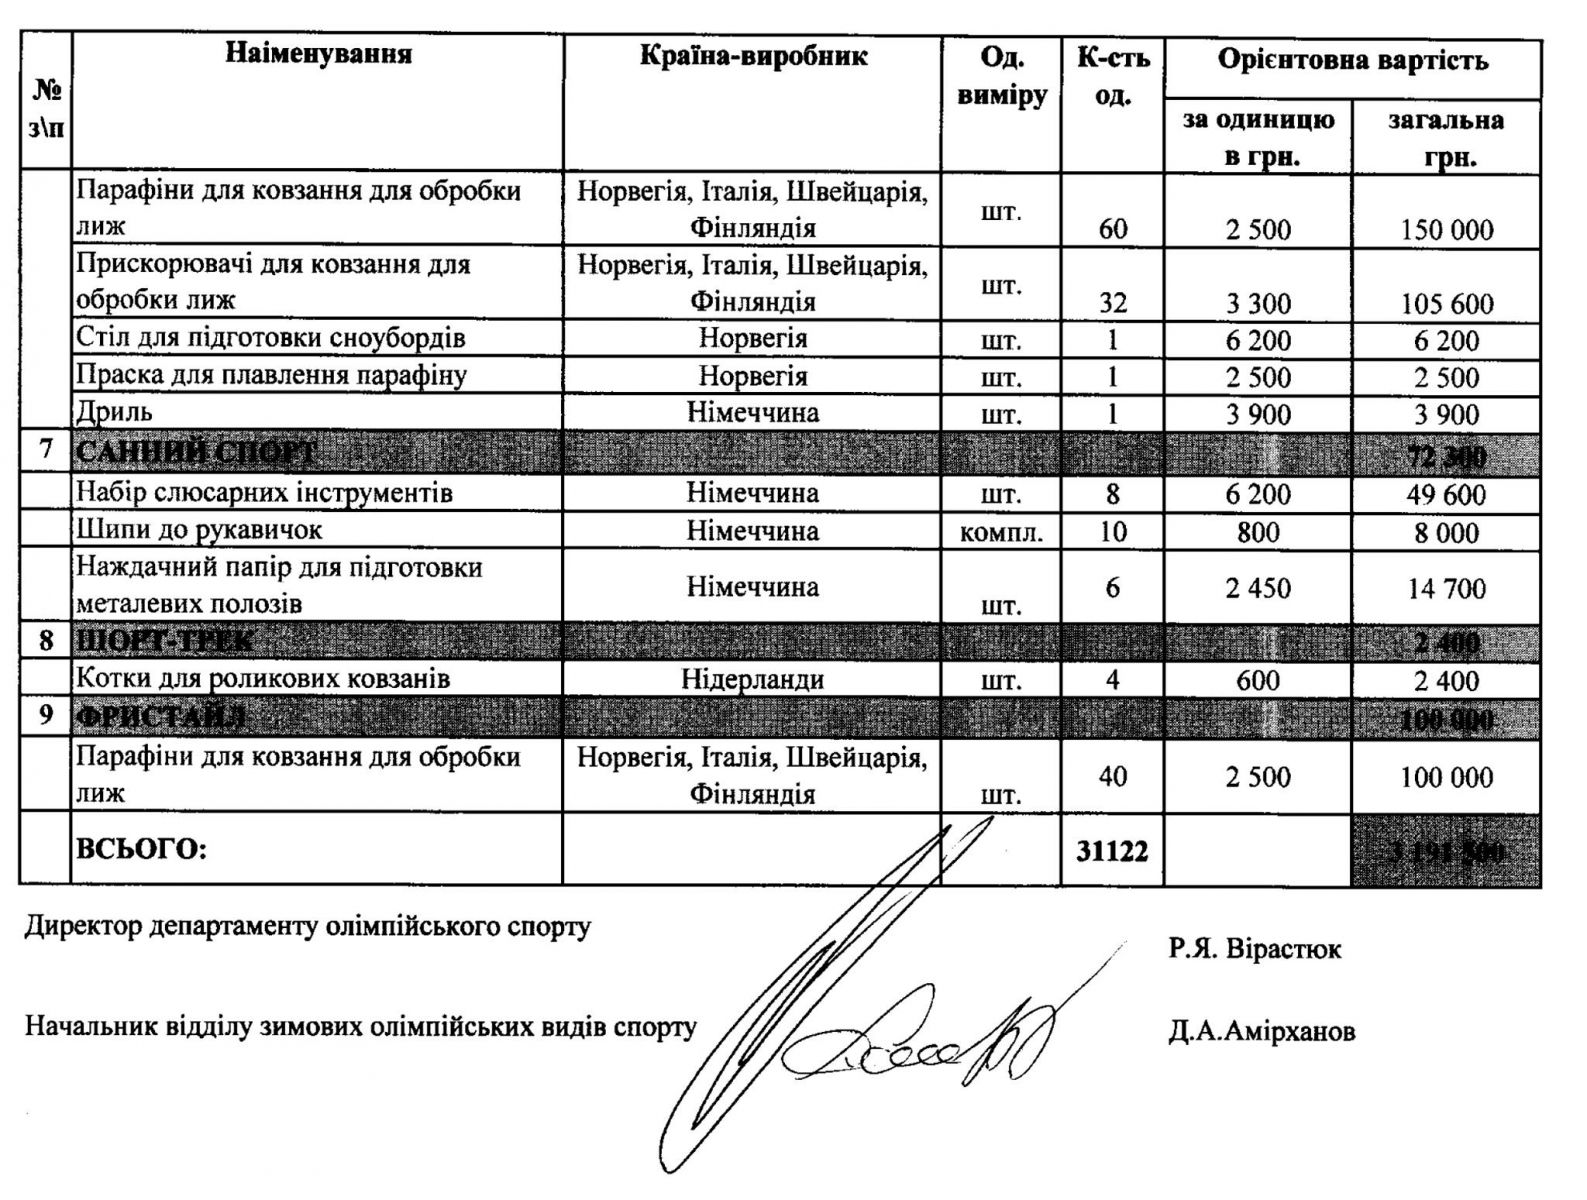 Документи: Facebook / Ігор Жданов